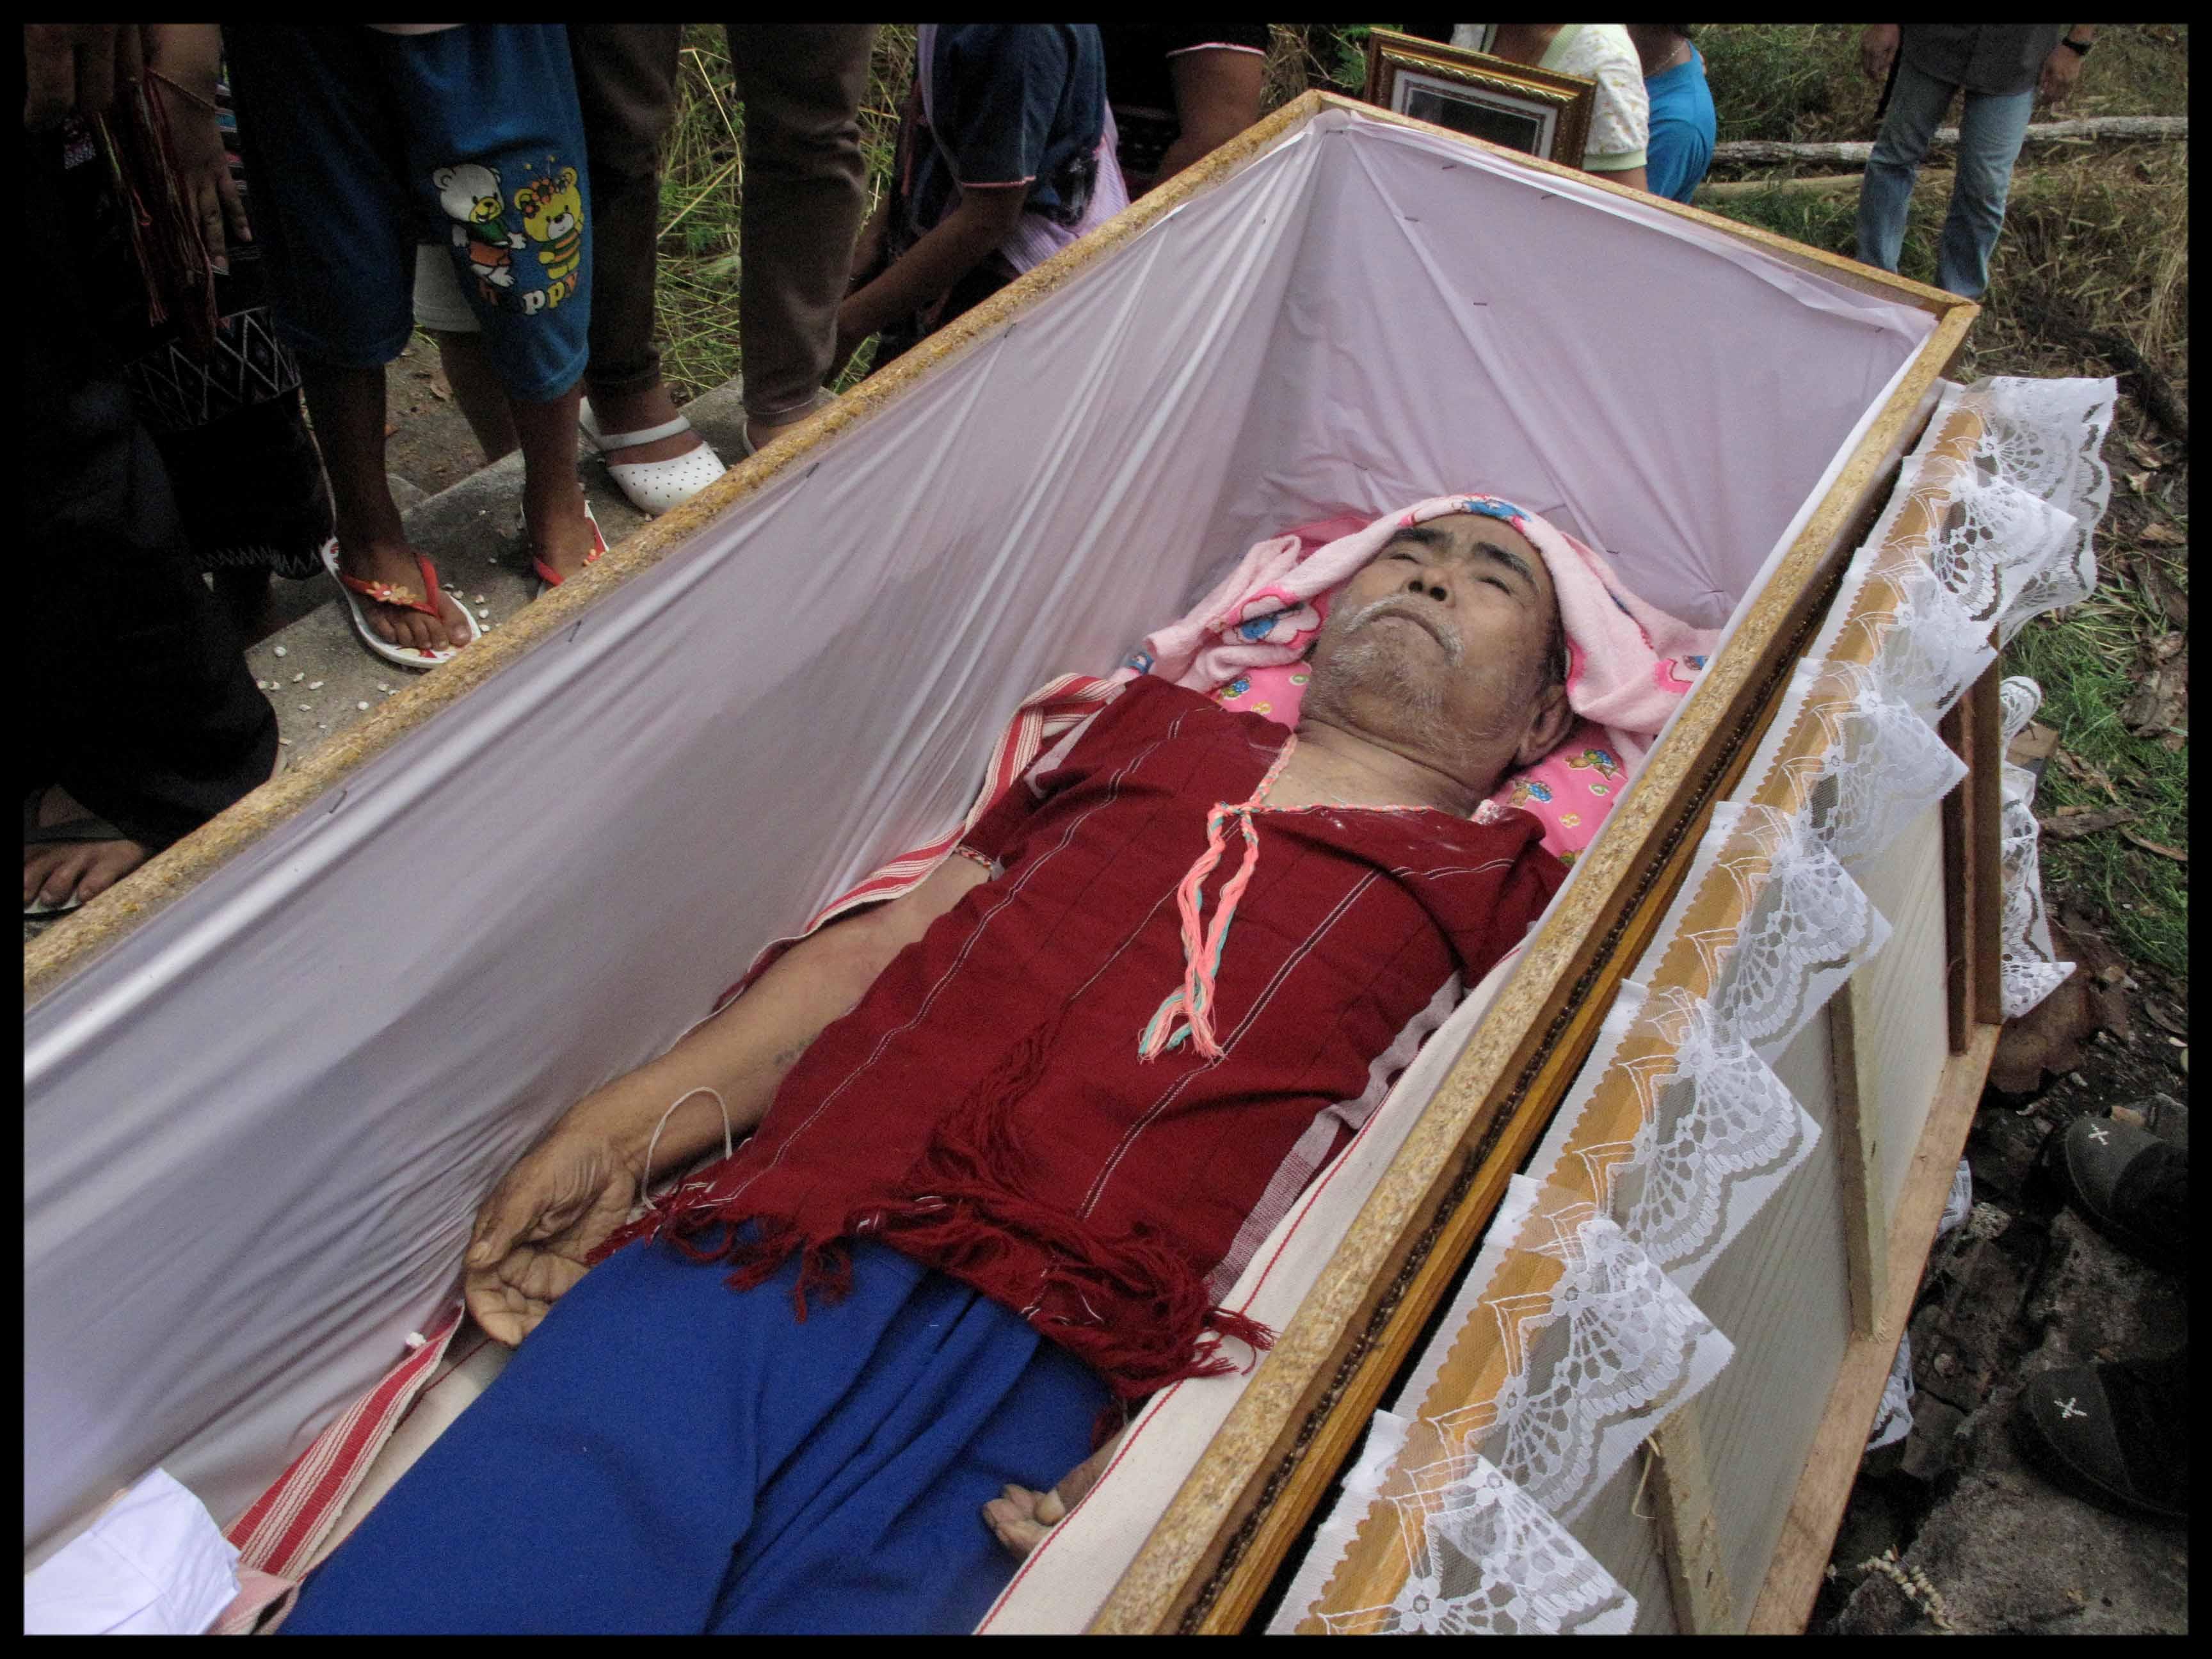 cercueil 15 ans apres